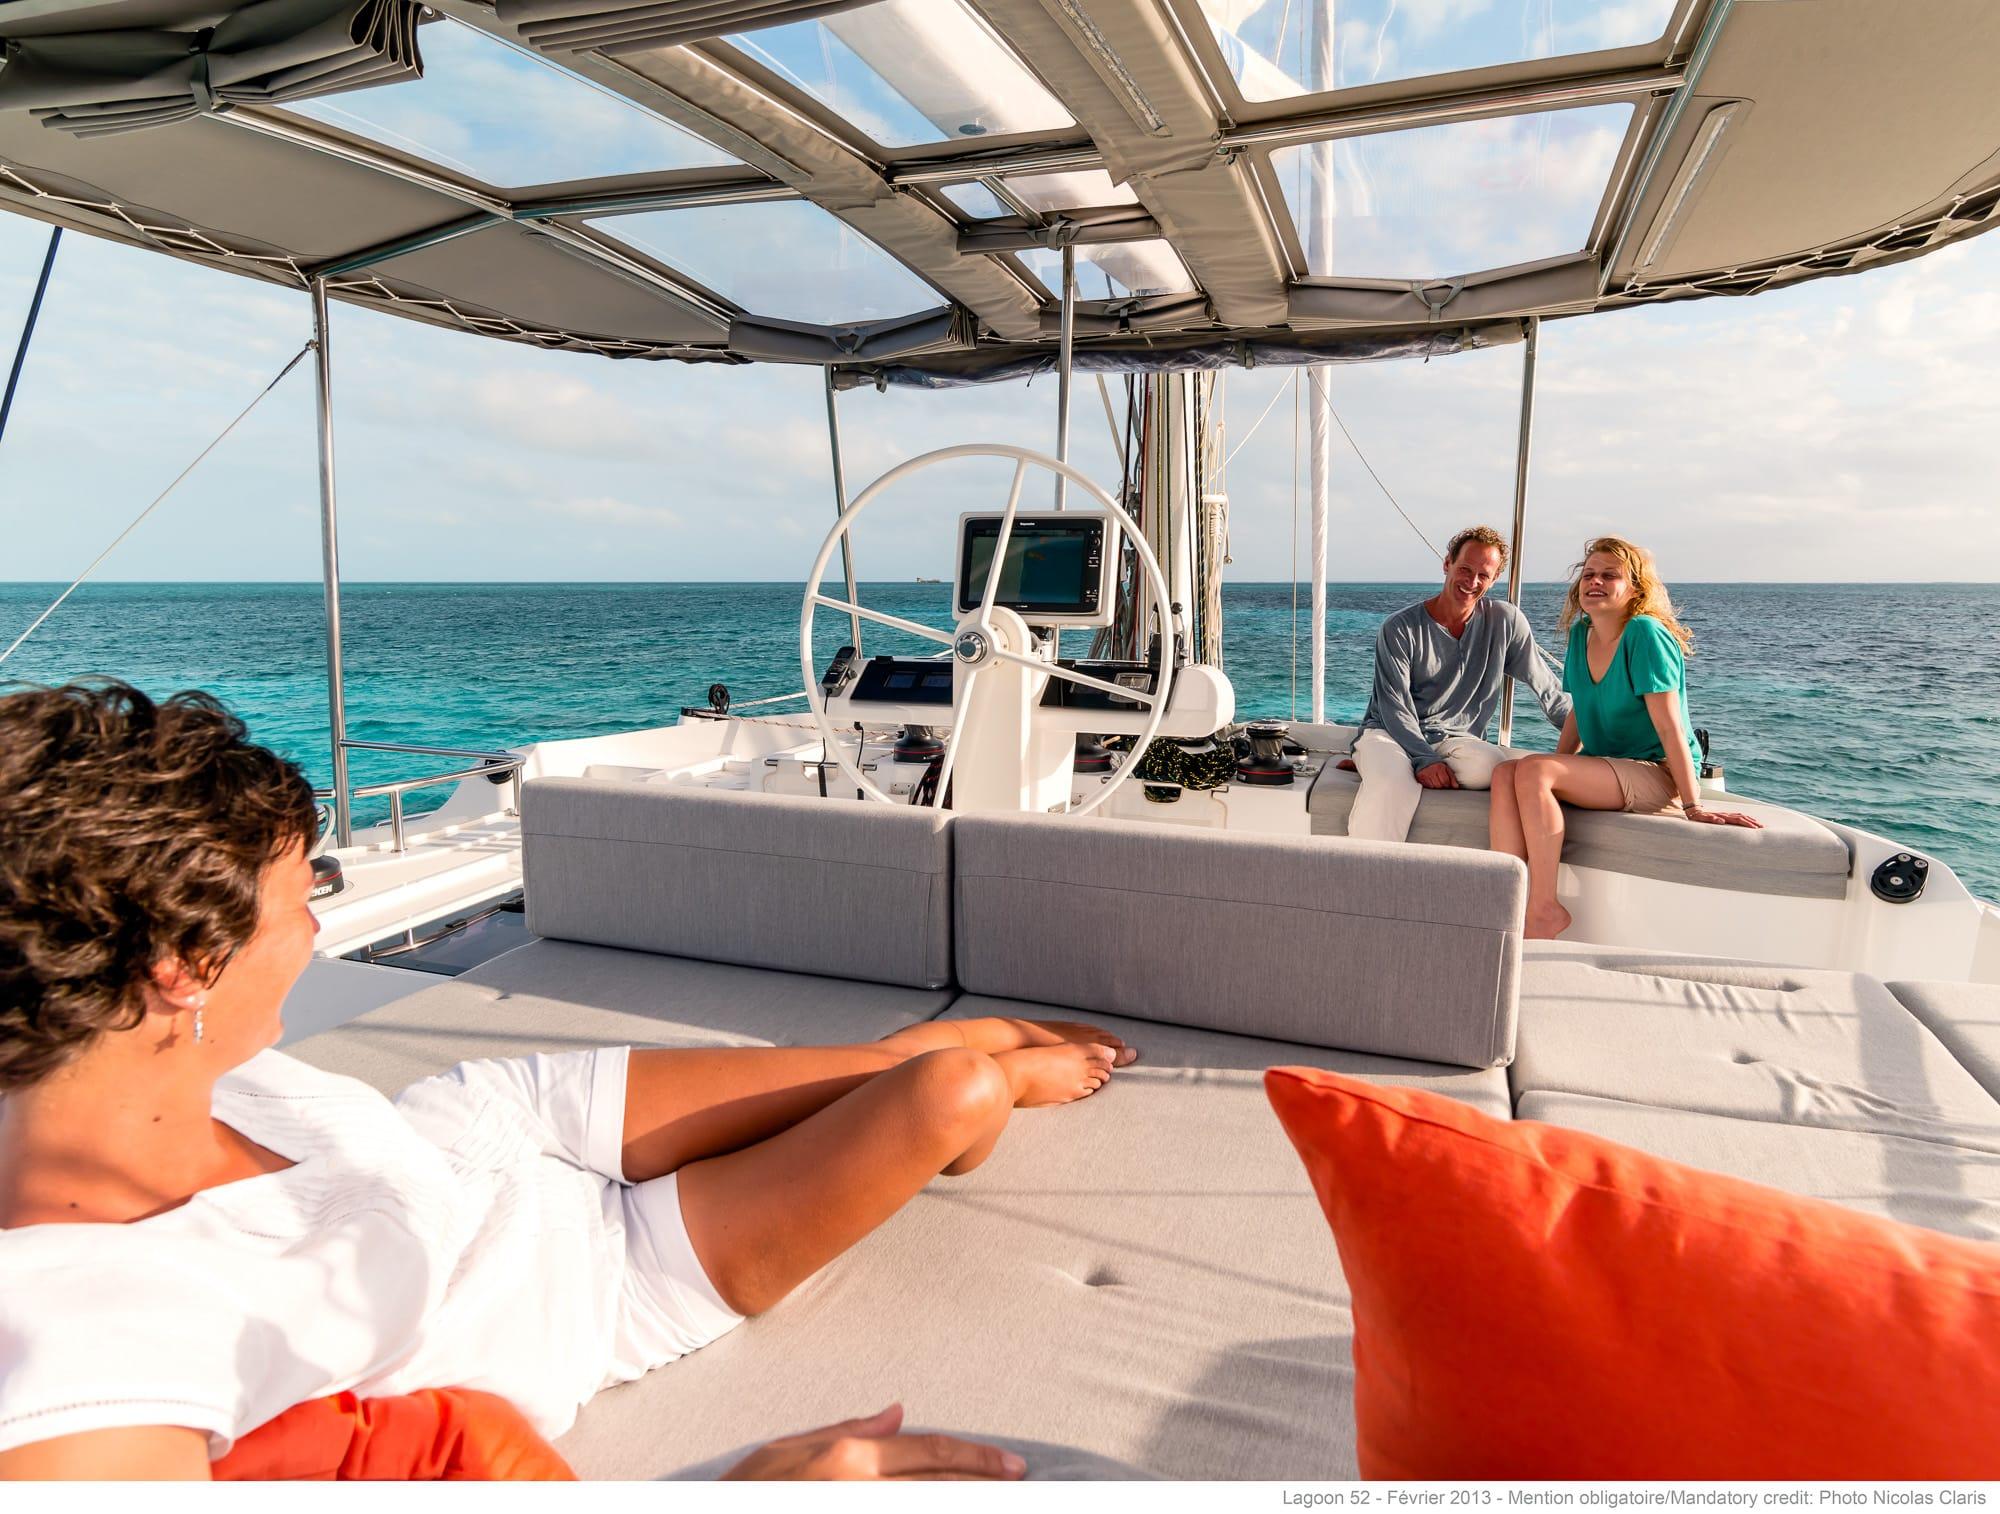 lagoon 52 f-yacht-charter-croatia-sailing-holidays-croatia-booking-yacht-charter-croatia-catamarans-sailboats-motorboats-gulets-luxury-yachts-boat-rental-croatia